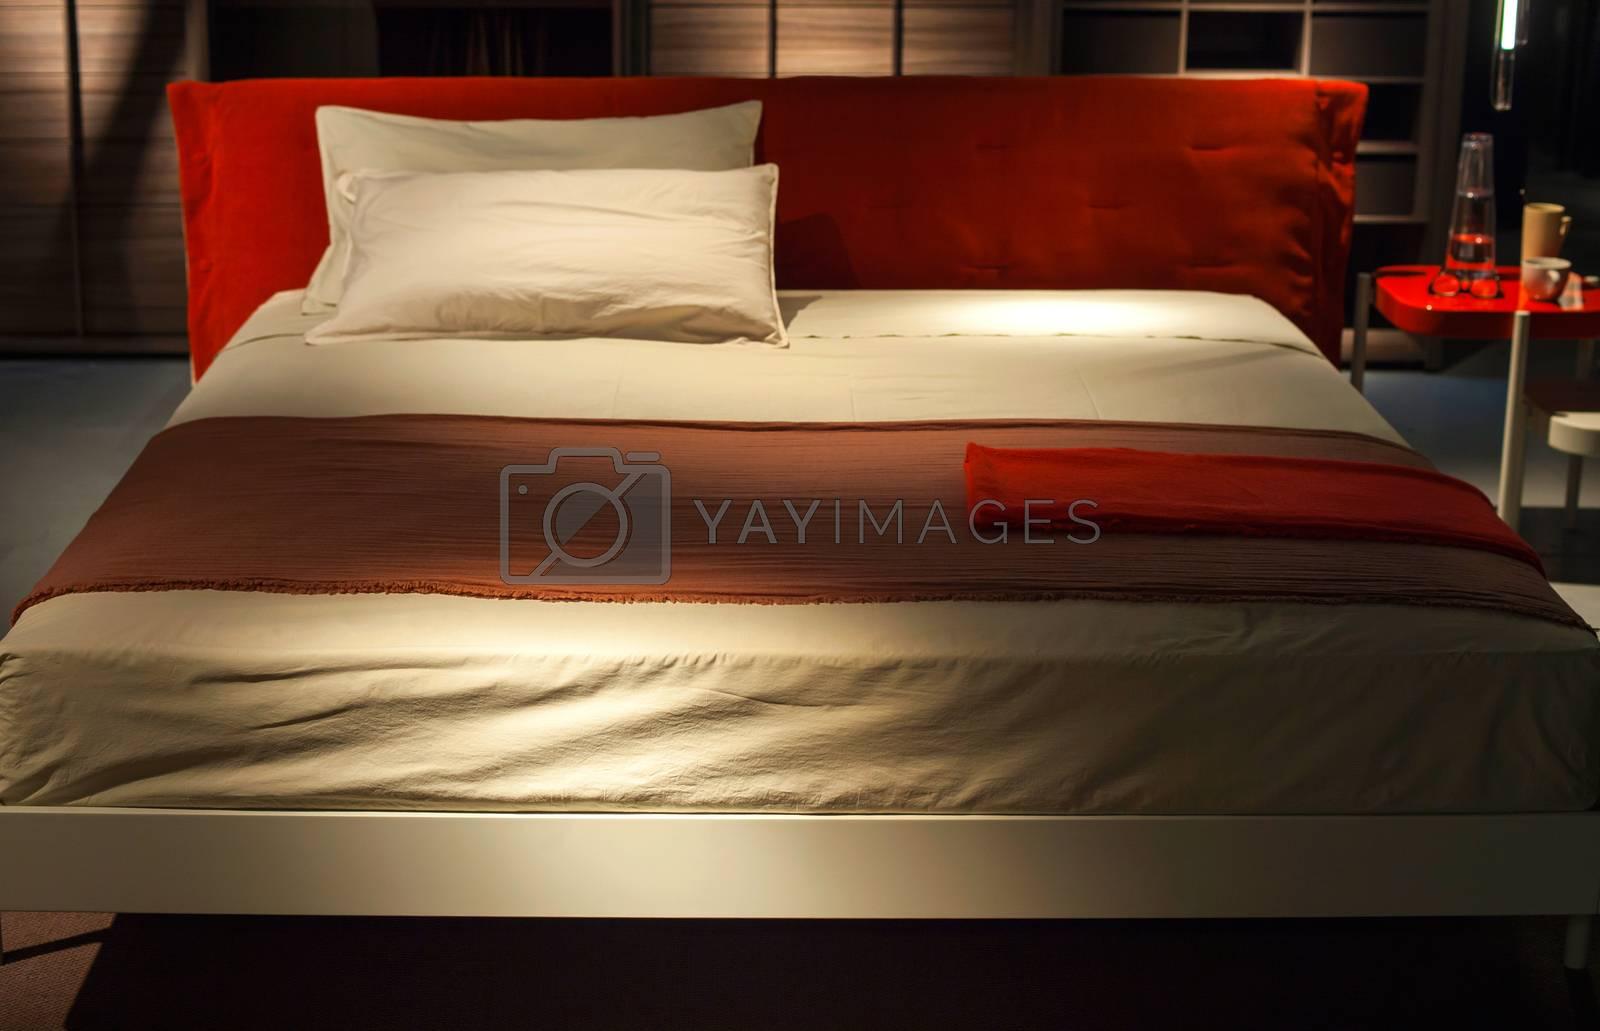 Bed, Ermione - Design by Francesco Bettoni by bepsimage